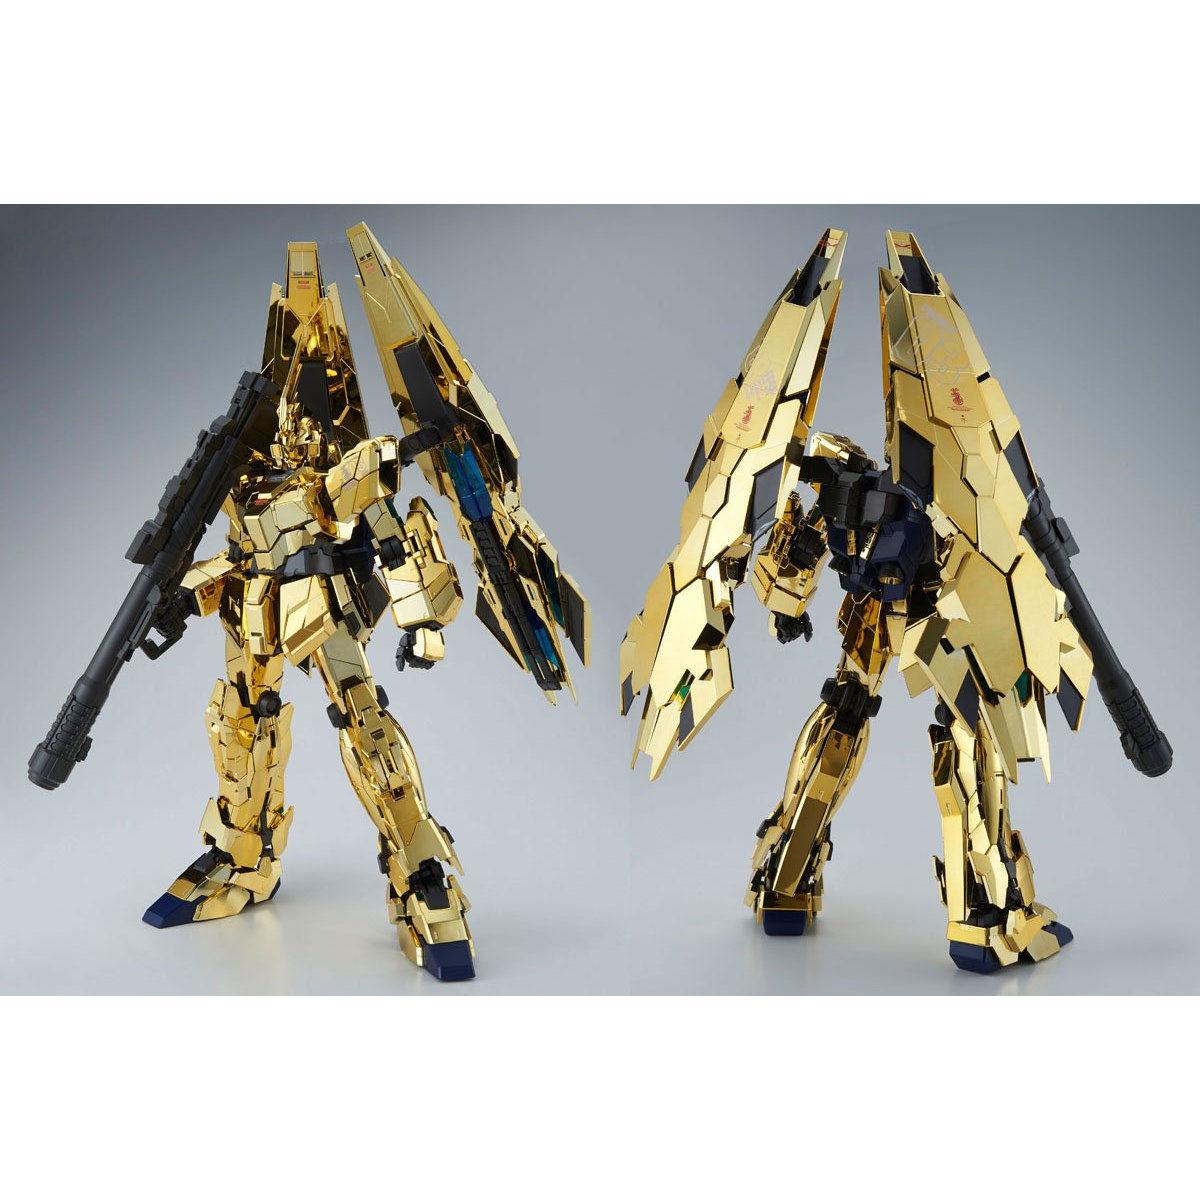 PG 1/60 RX-0 ユニコーンガンダム3号機 フェネクス [Unicorn Gundam 03 Phenex]